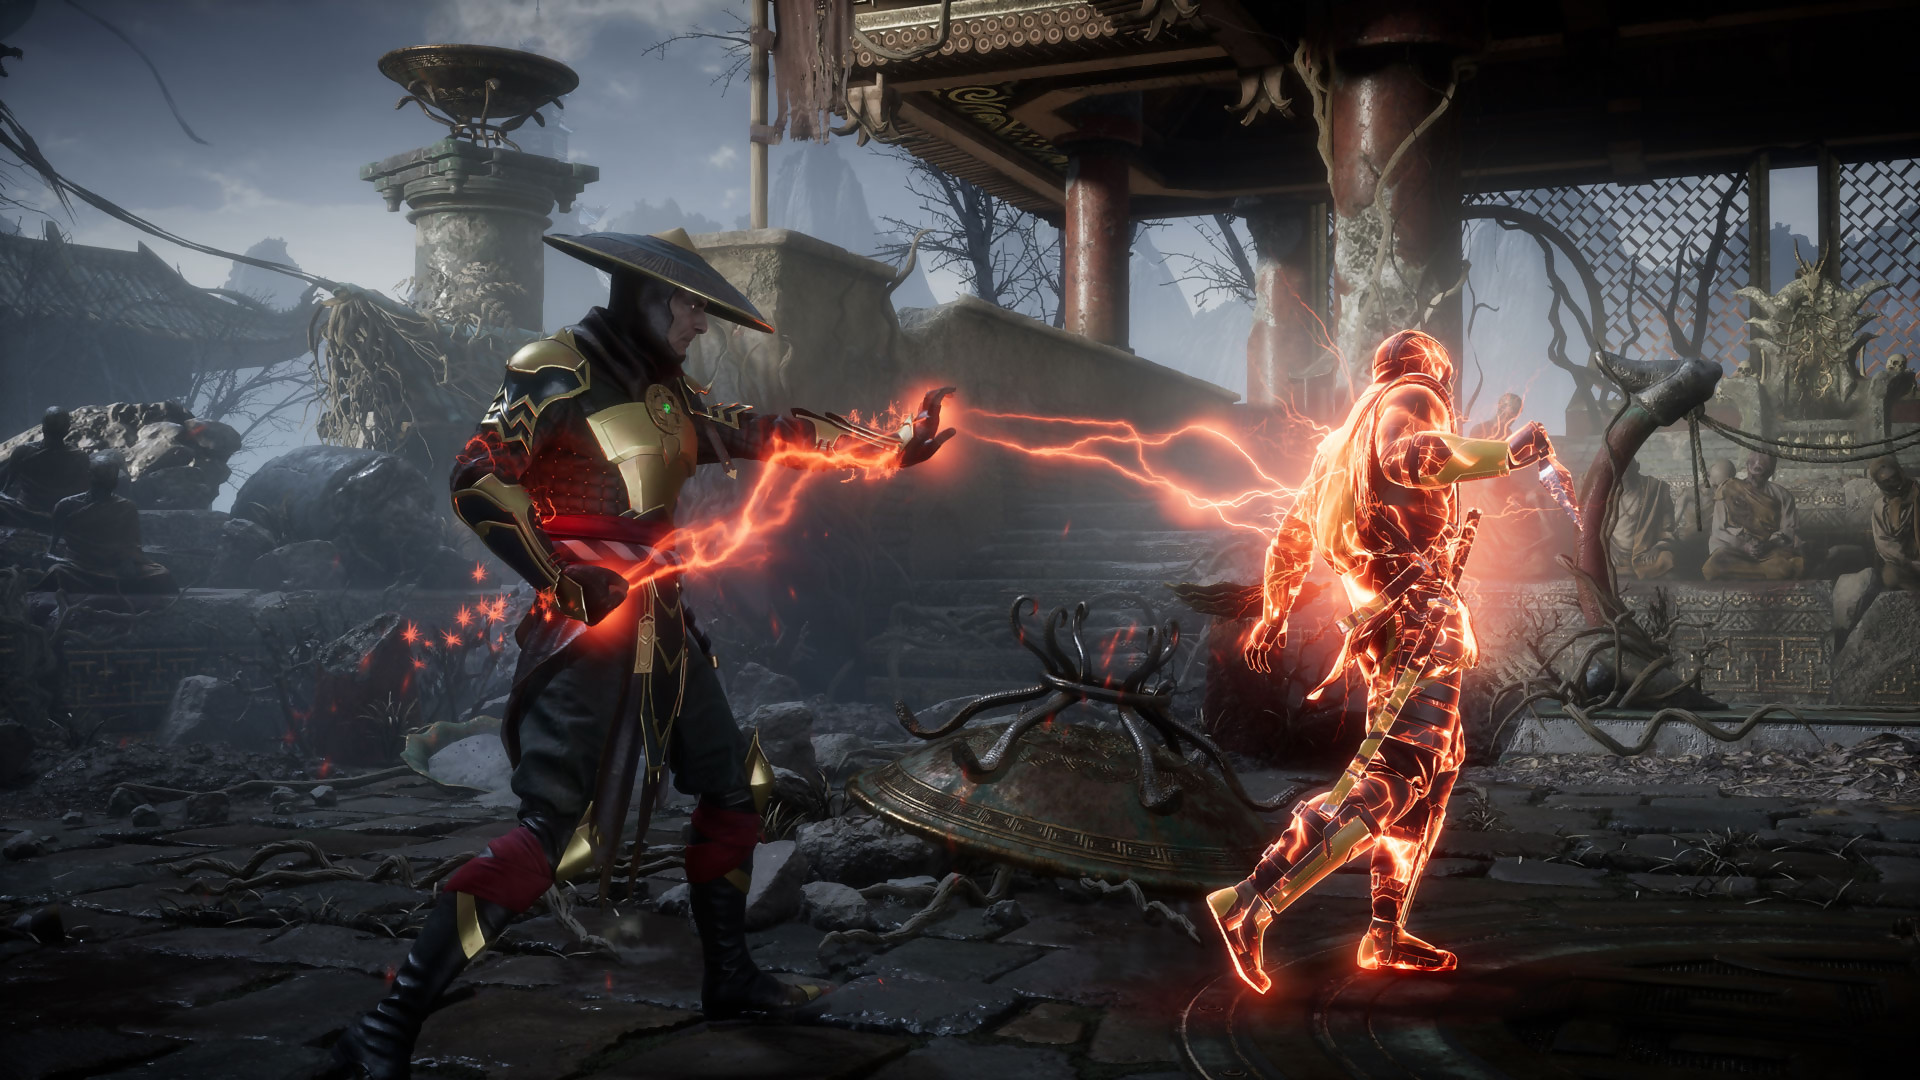 Mortal Kombat 11 Nouvelle Salve De Screenshots Sanglants